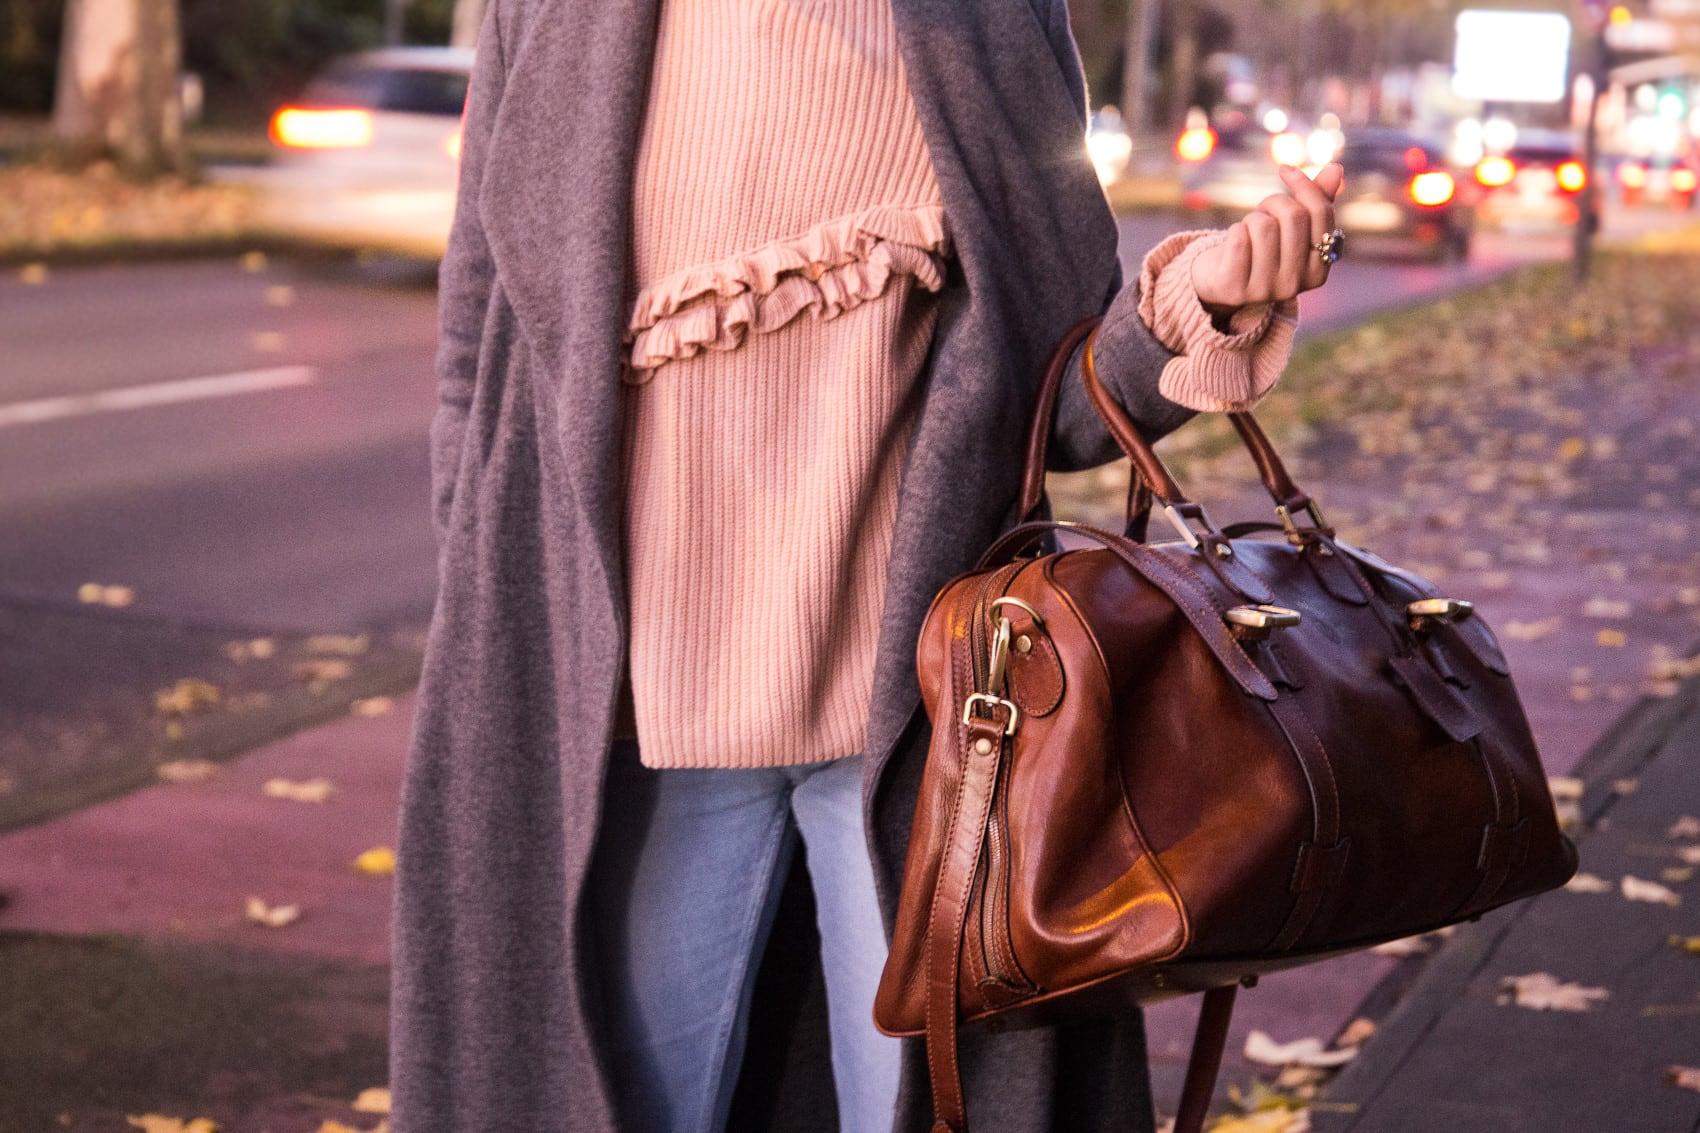 Novembertage - Langer grauer Mantel, helle Jeans und Leder Weekender